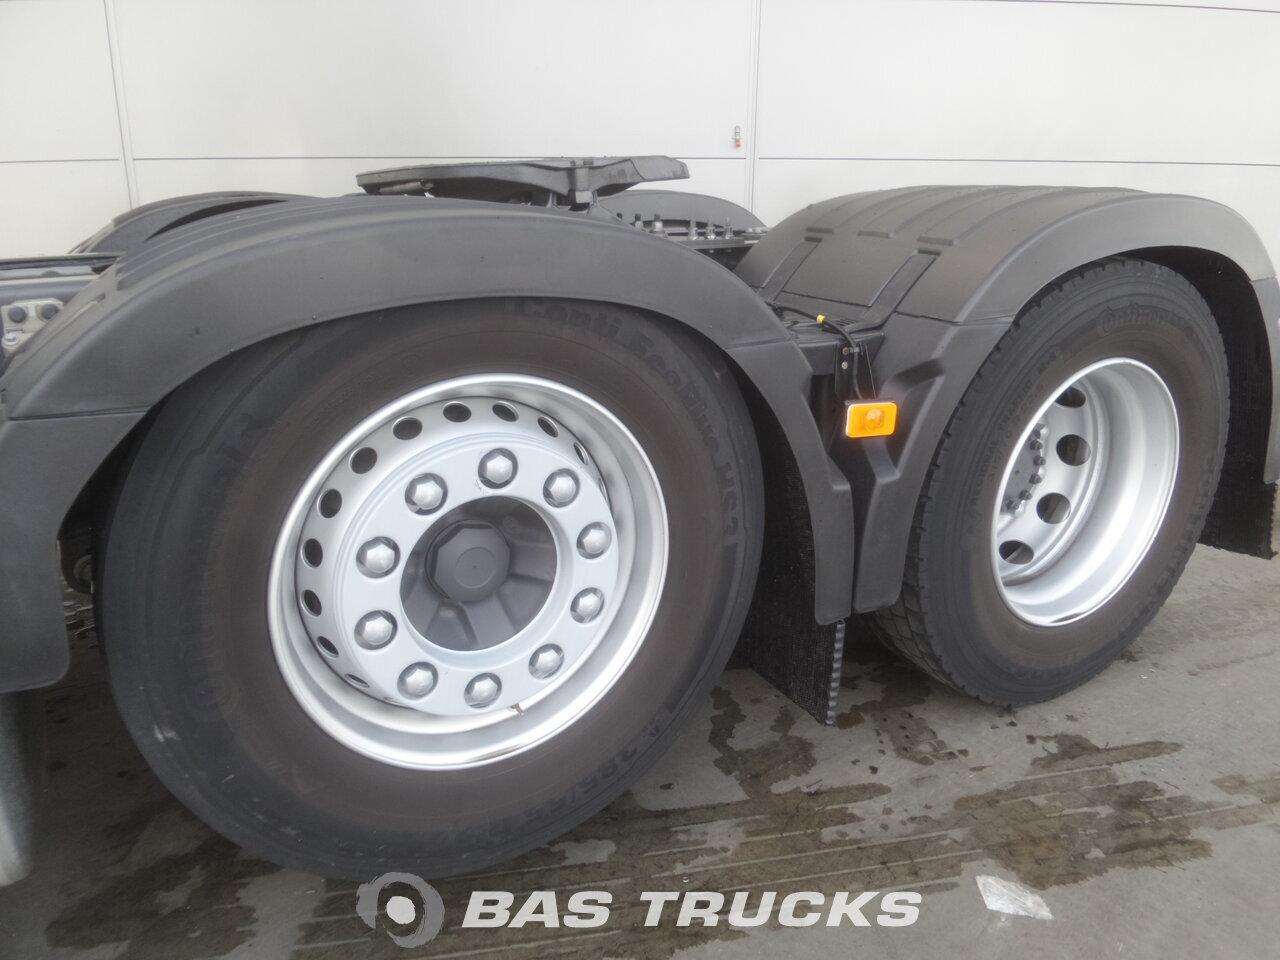 photo de Occasion Tracteur Volvo FH 460 Unfall Fahrbereit Motor & Getriebe OK 6X2 2015